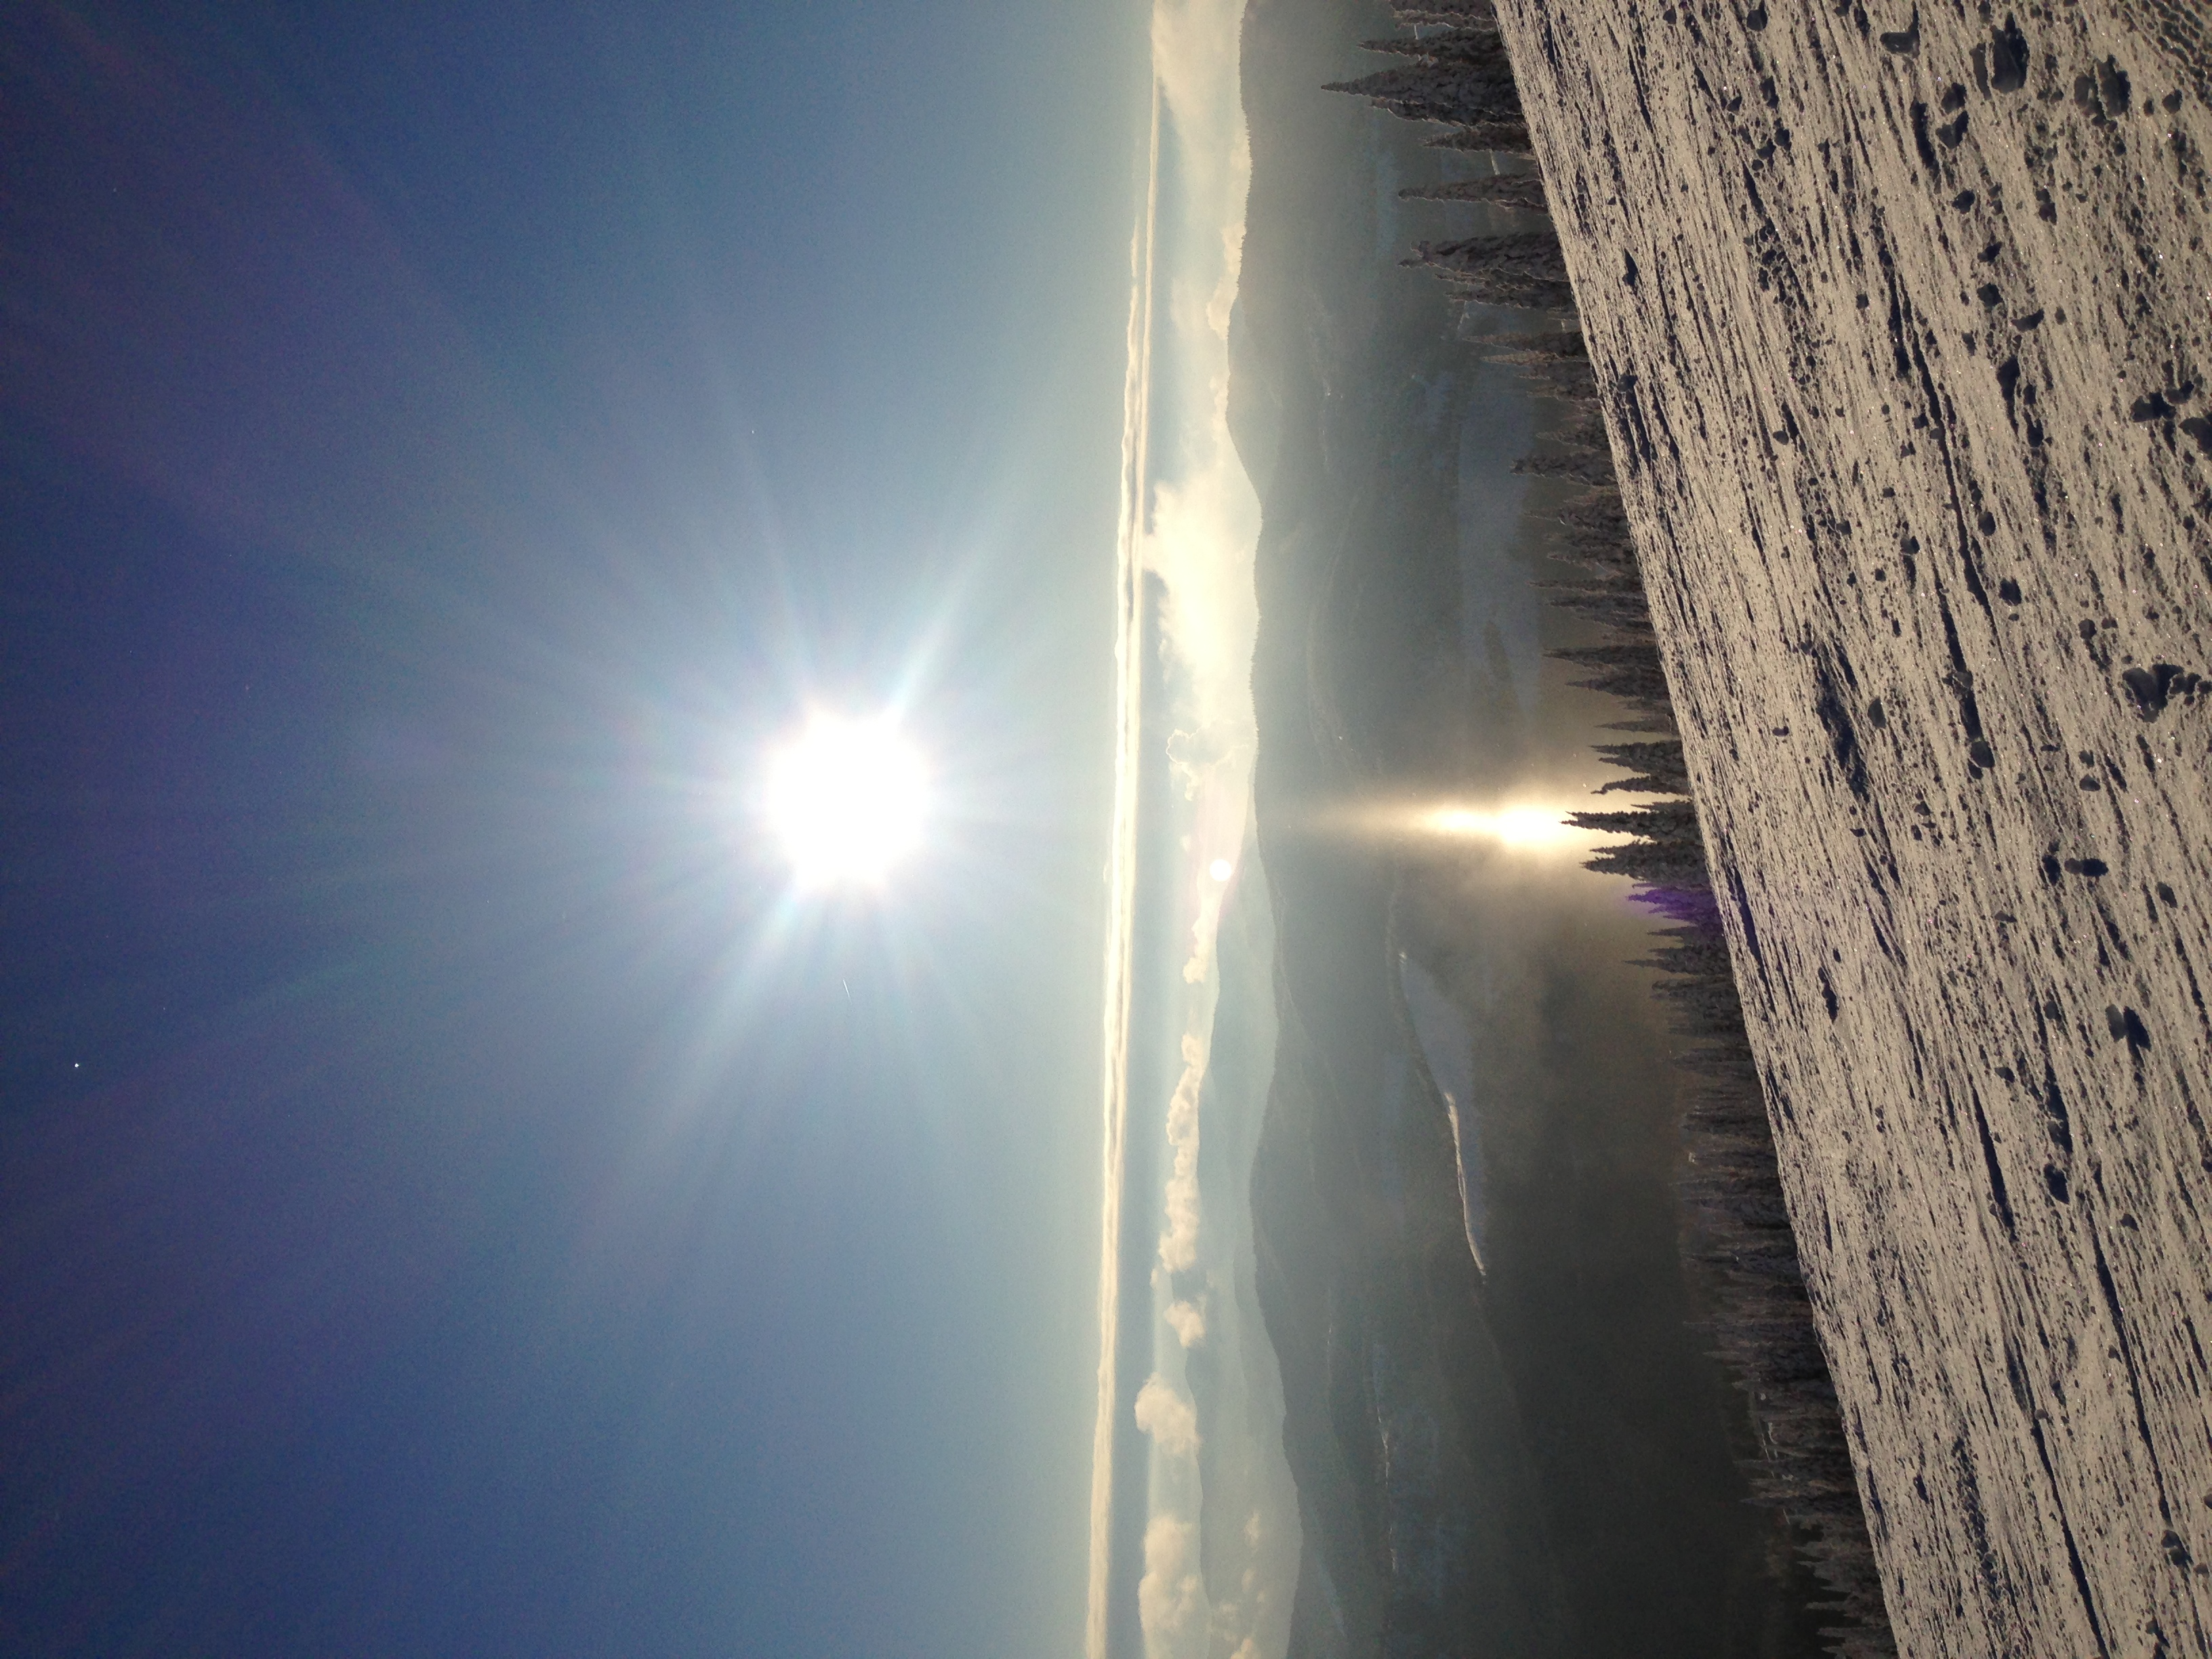 Sun Pillar Mt. Spokane, Mt Spokane Ski and Snowboard Park